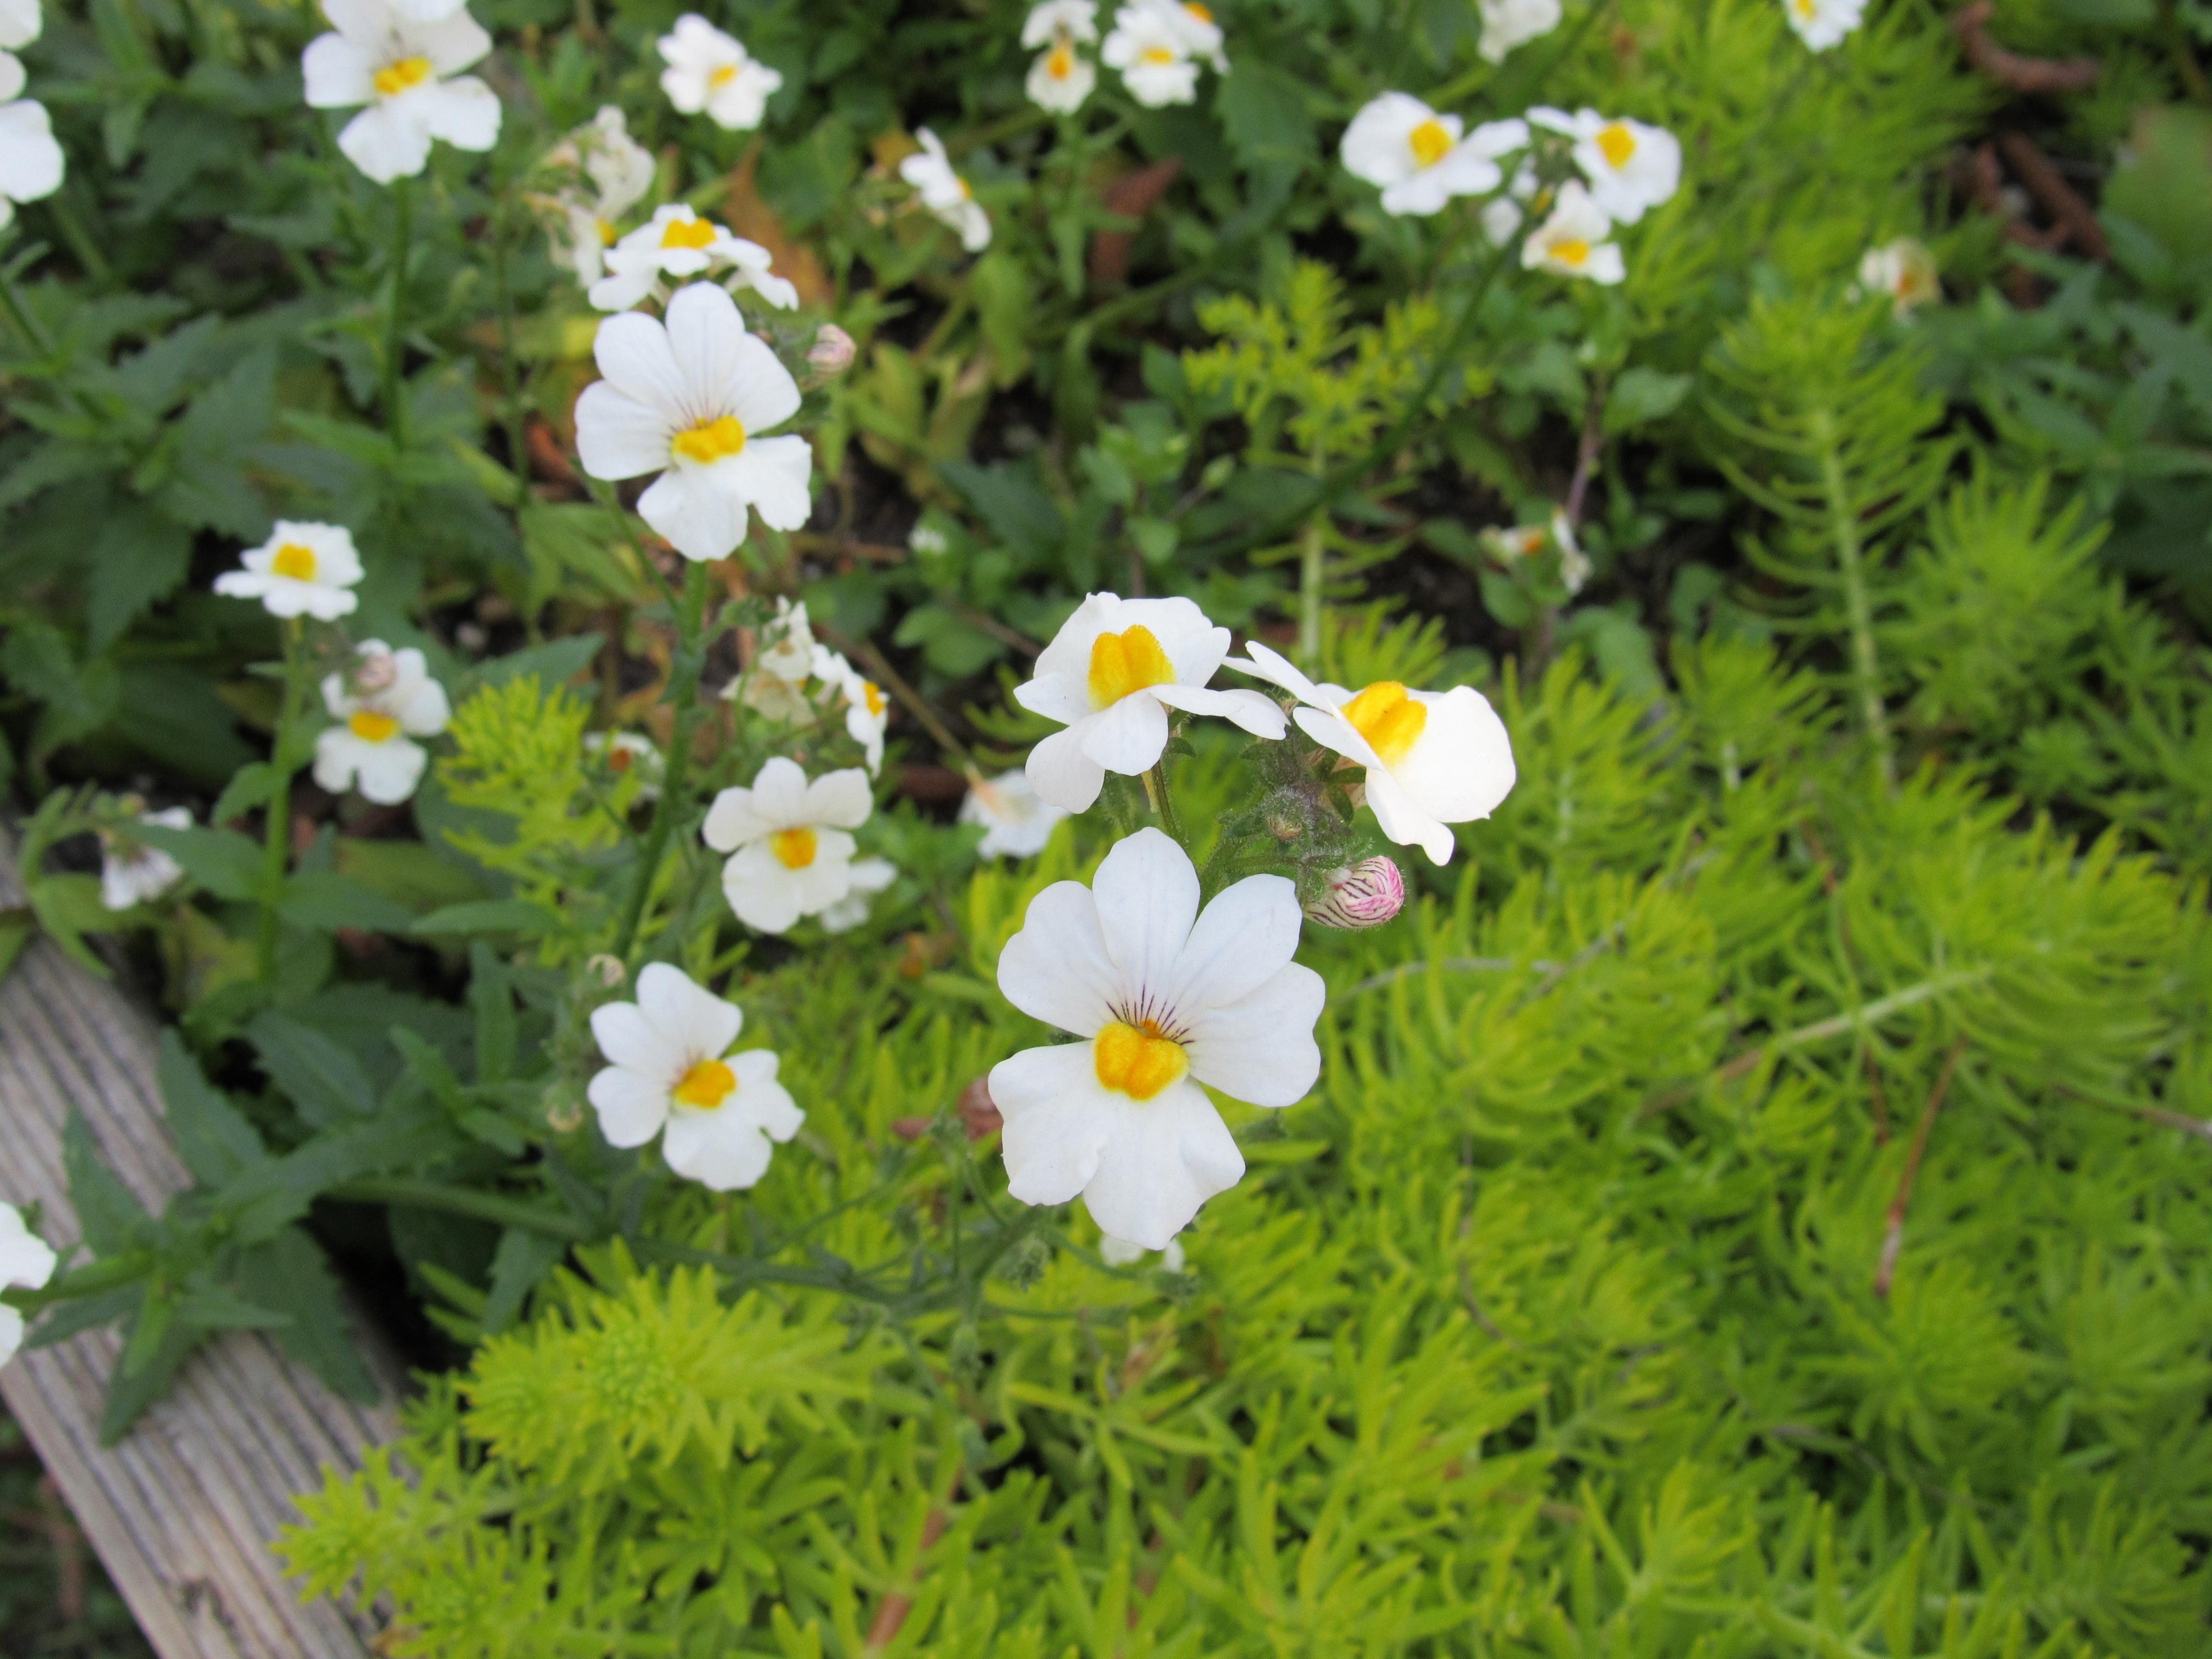 Dainty white flowers